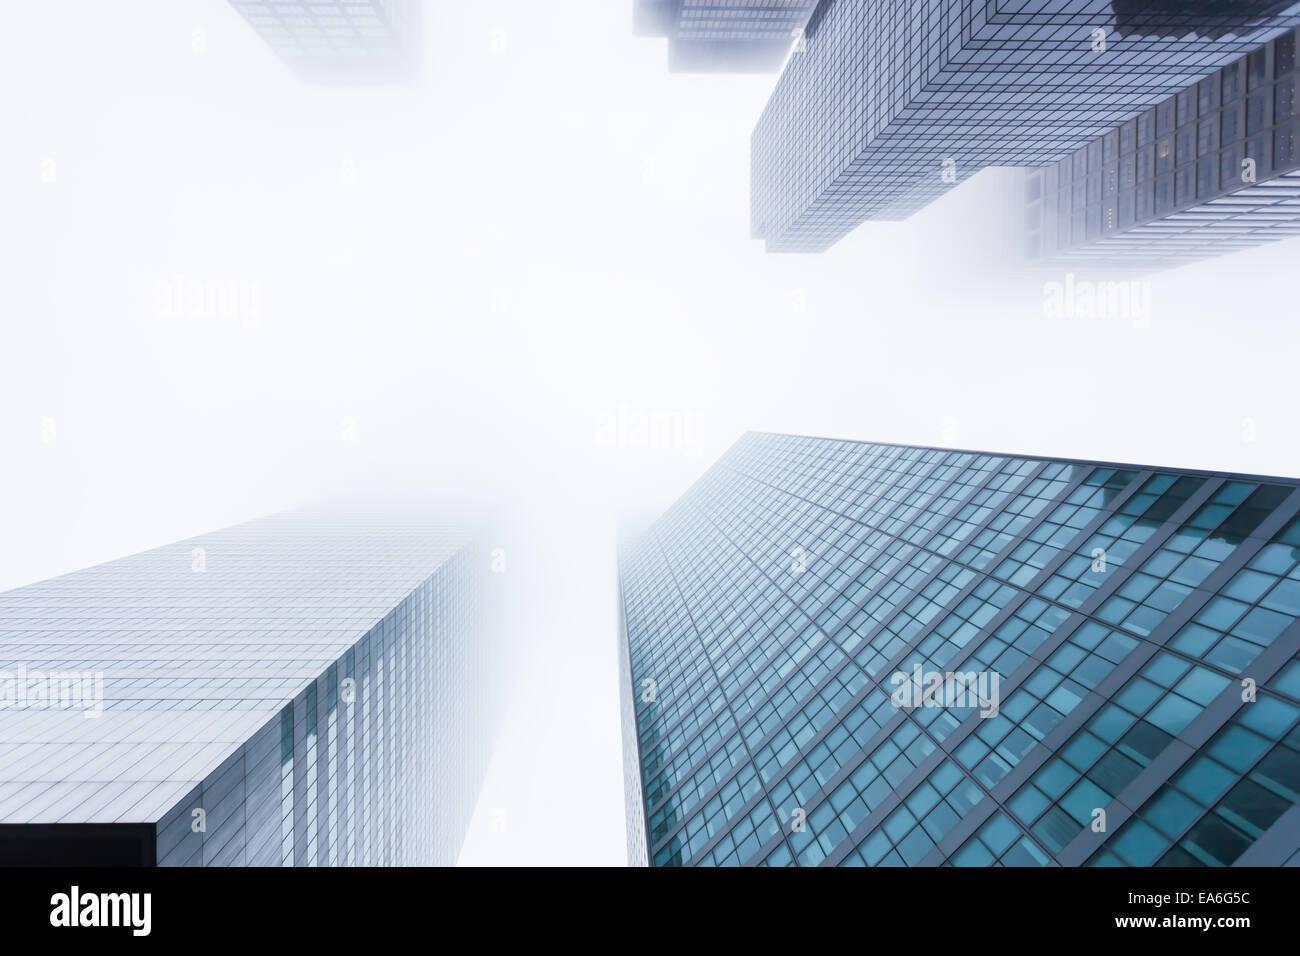 USA, New York State, New York, Manhattan, View of skyscrapers in mist Photo Stock